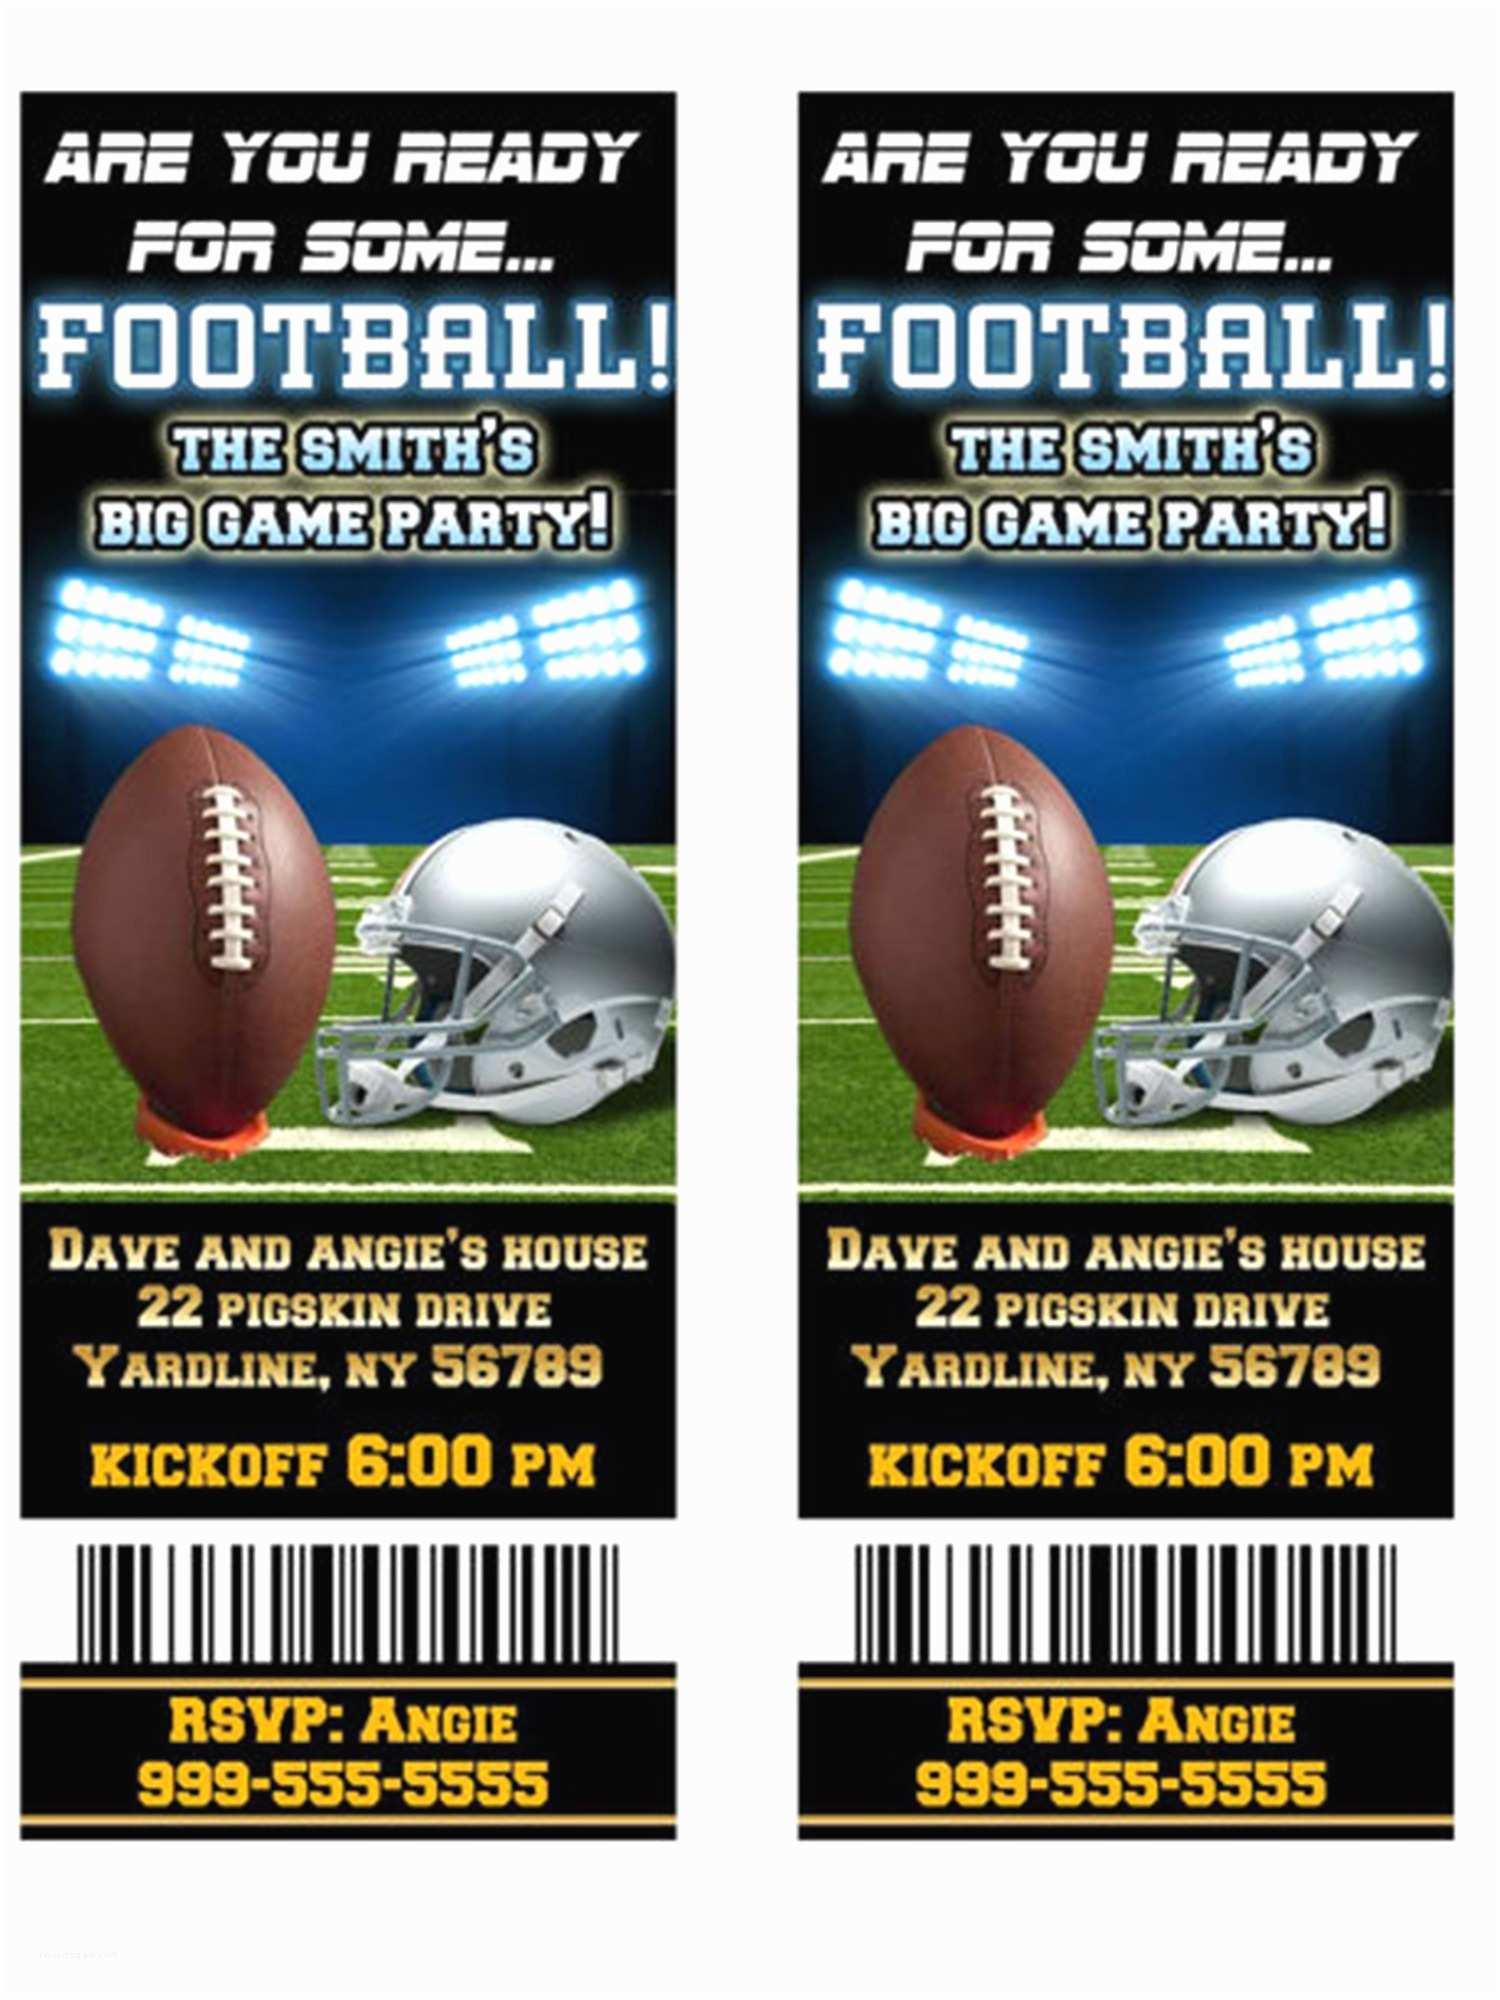 Super Bowl Party Invitations Super Bowl Party Ideas Decorations Games Serveware